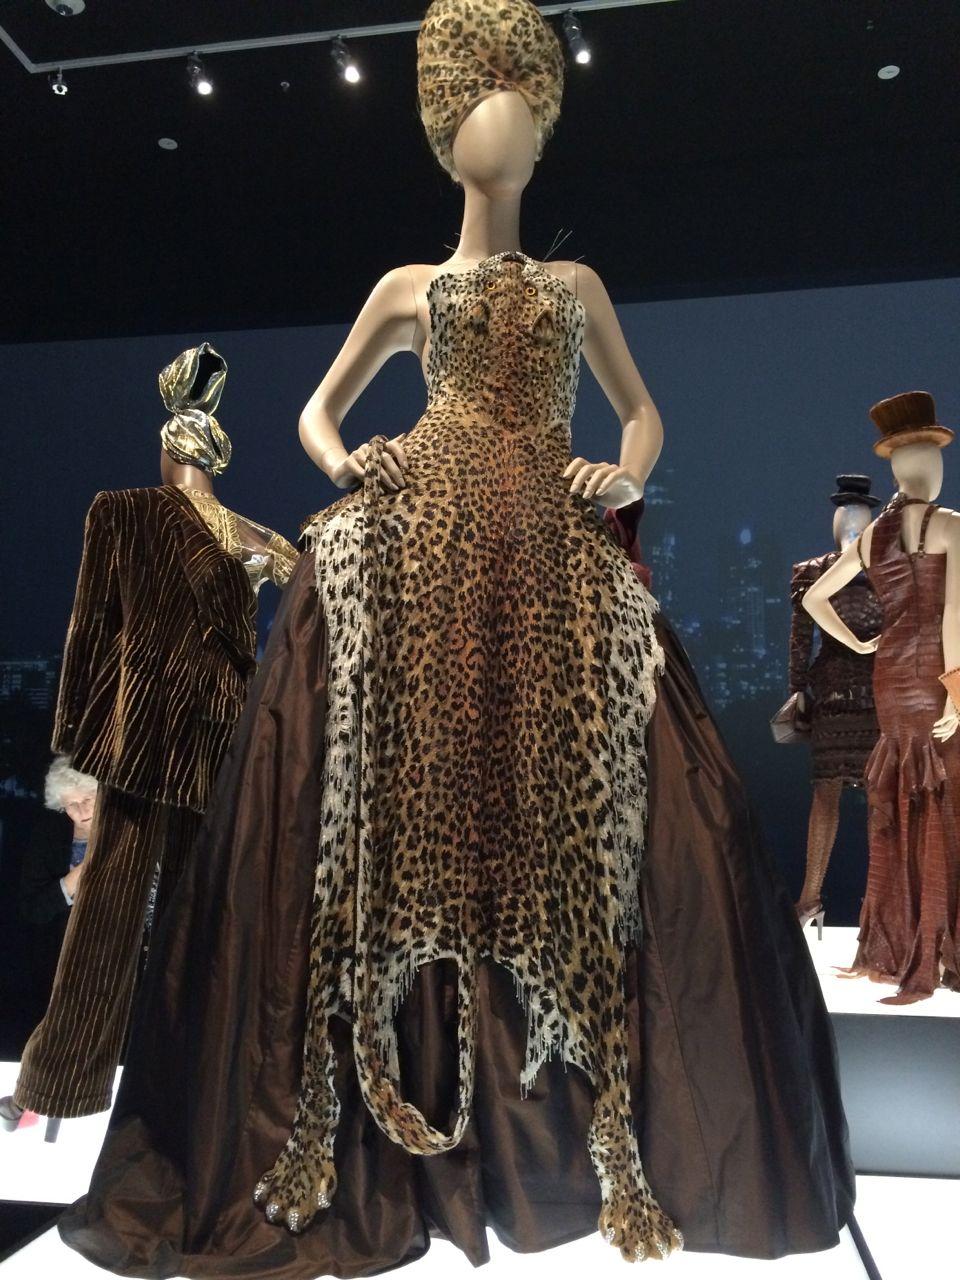 Amazing leopard dress.Love that leopard beehive! Photo by nazneenzainal.com